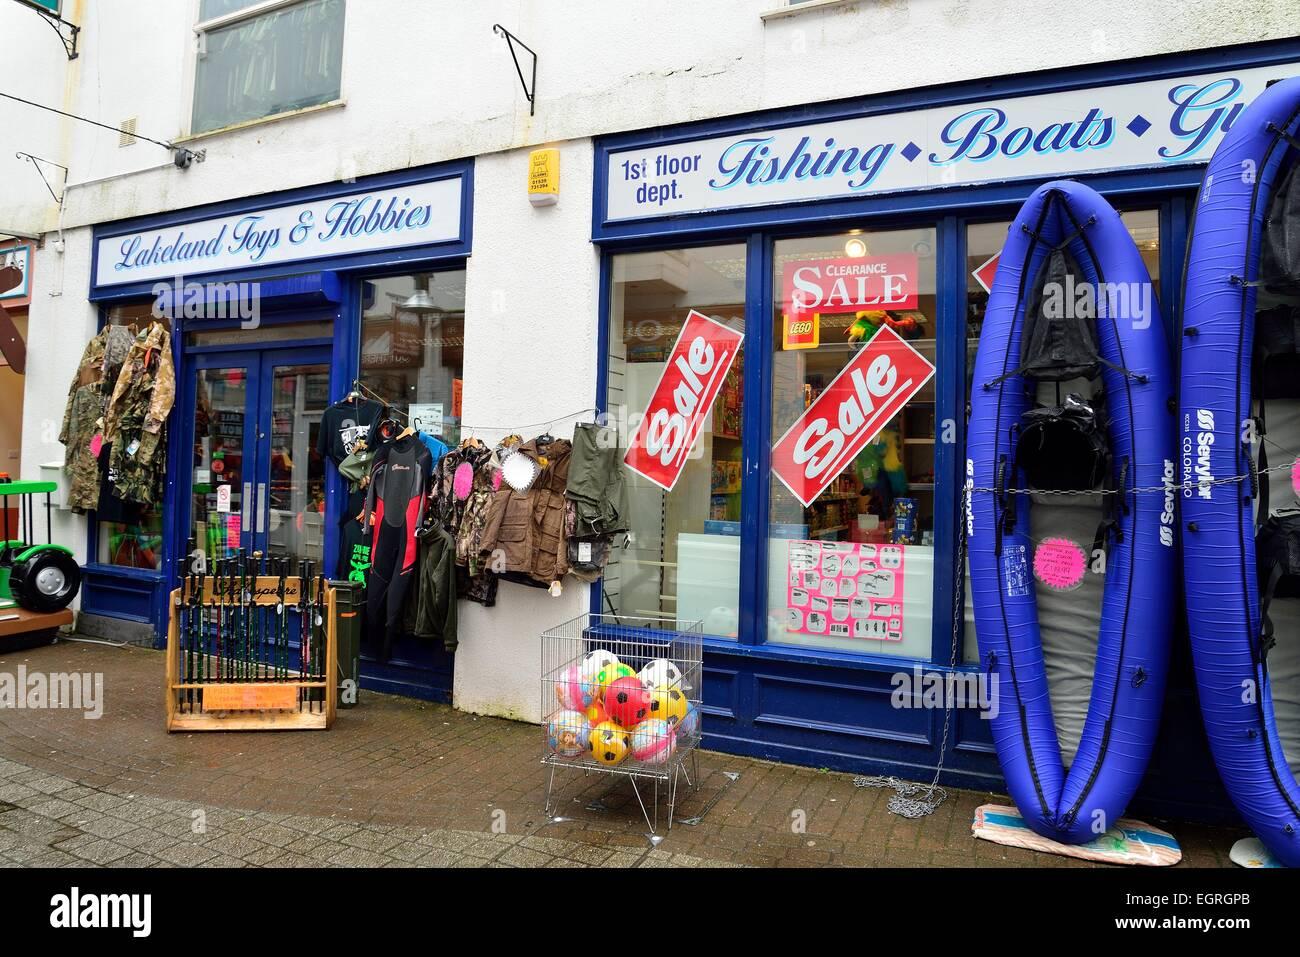 Lakeland-Spielzeug und Hobby-Shop in Keswick cumbria Stockfoto